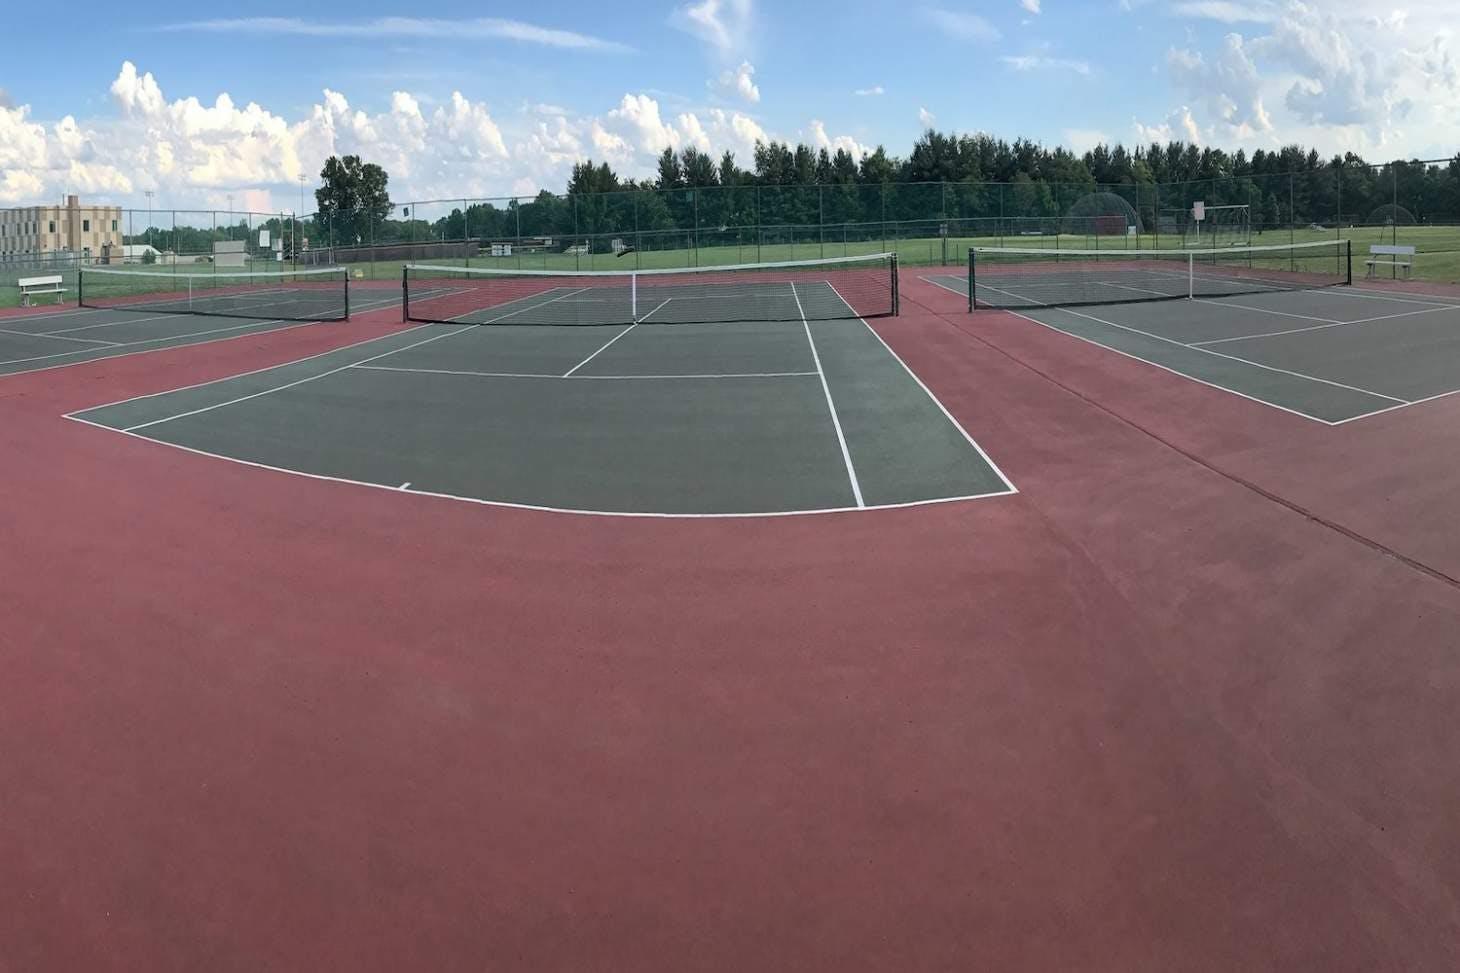 Hillsborough Park Outdoor | Hard (macadam) tennis court